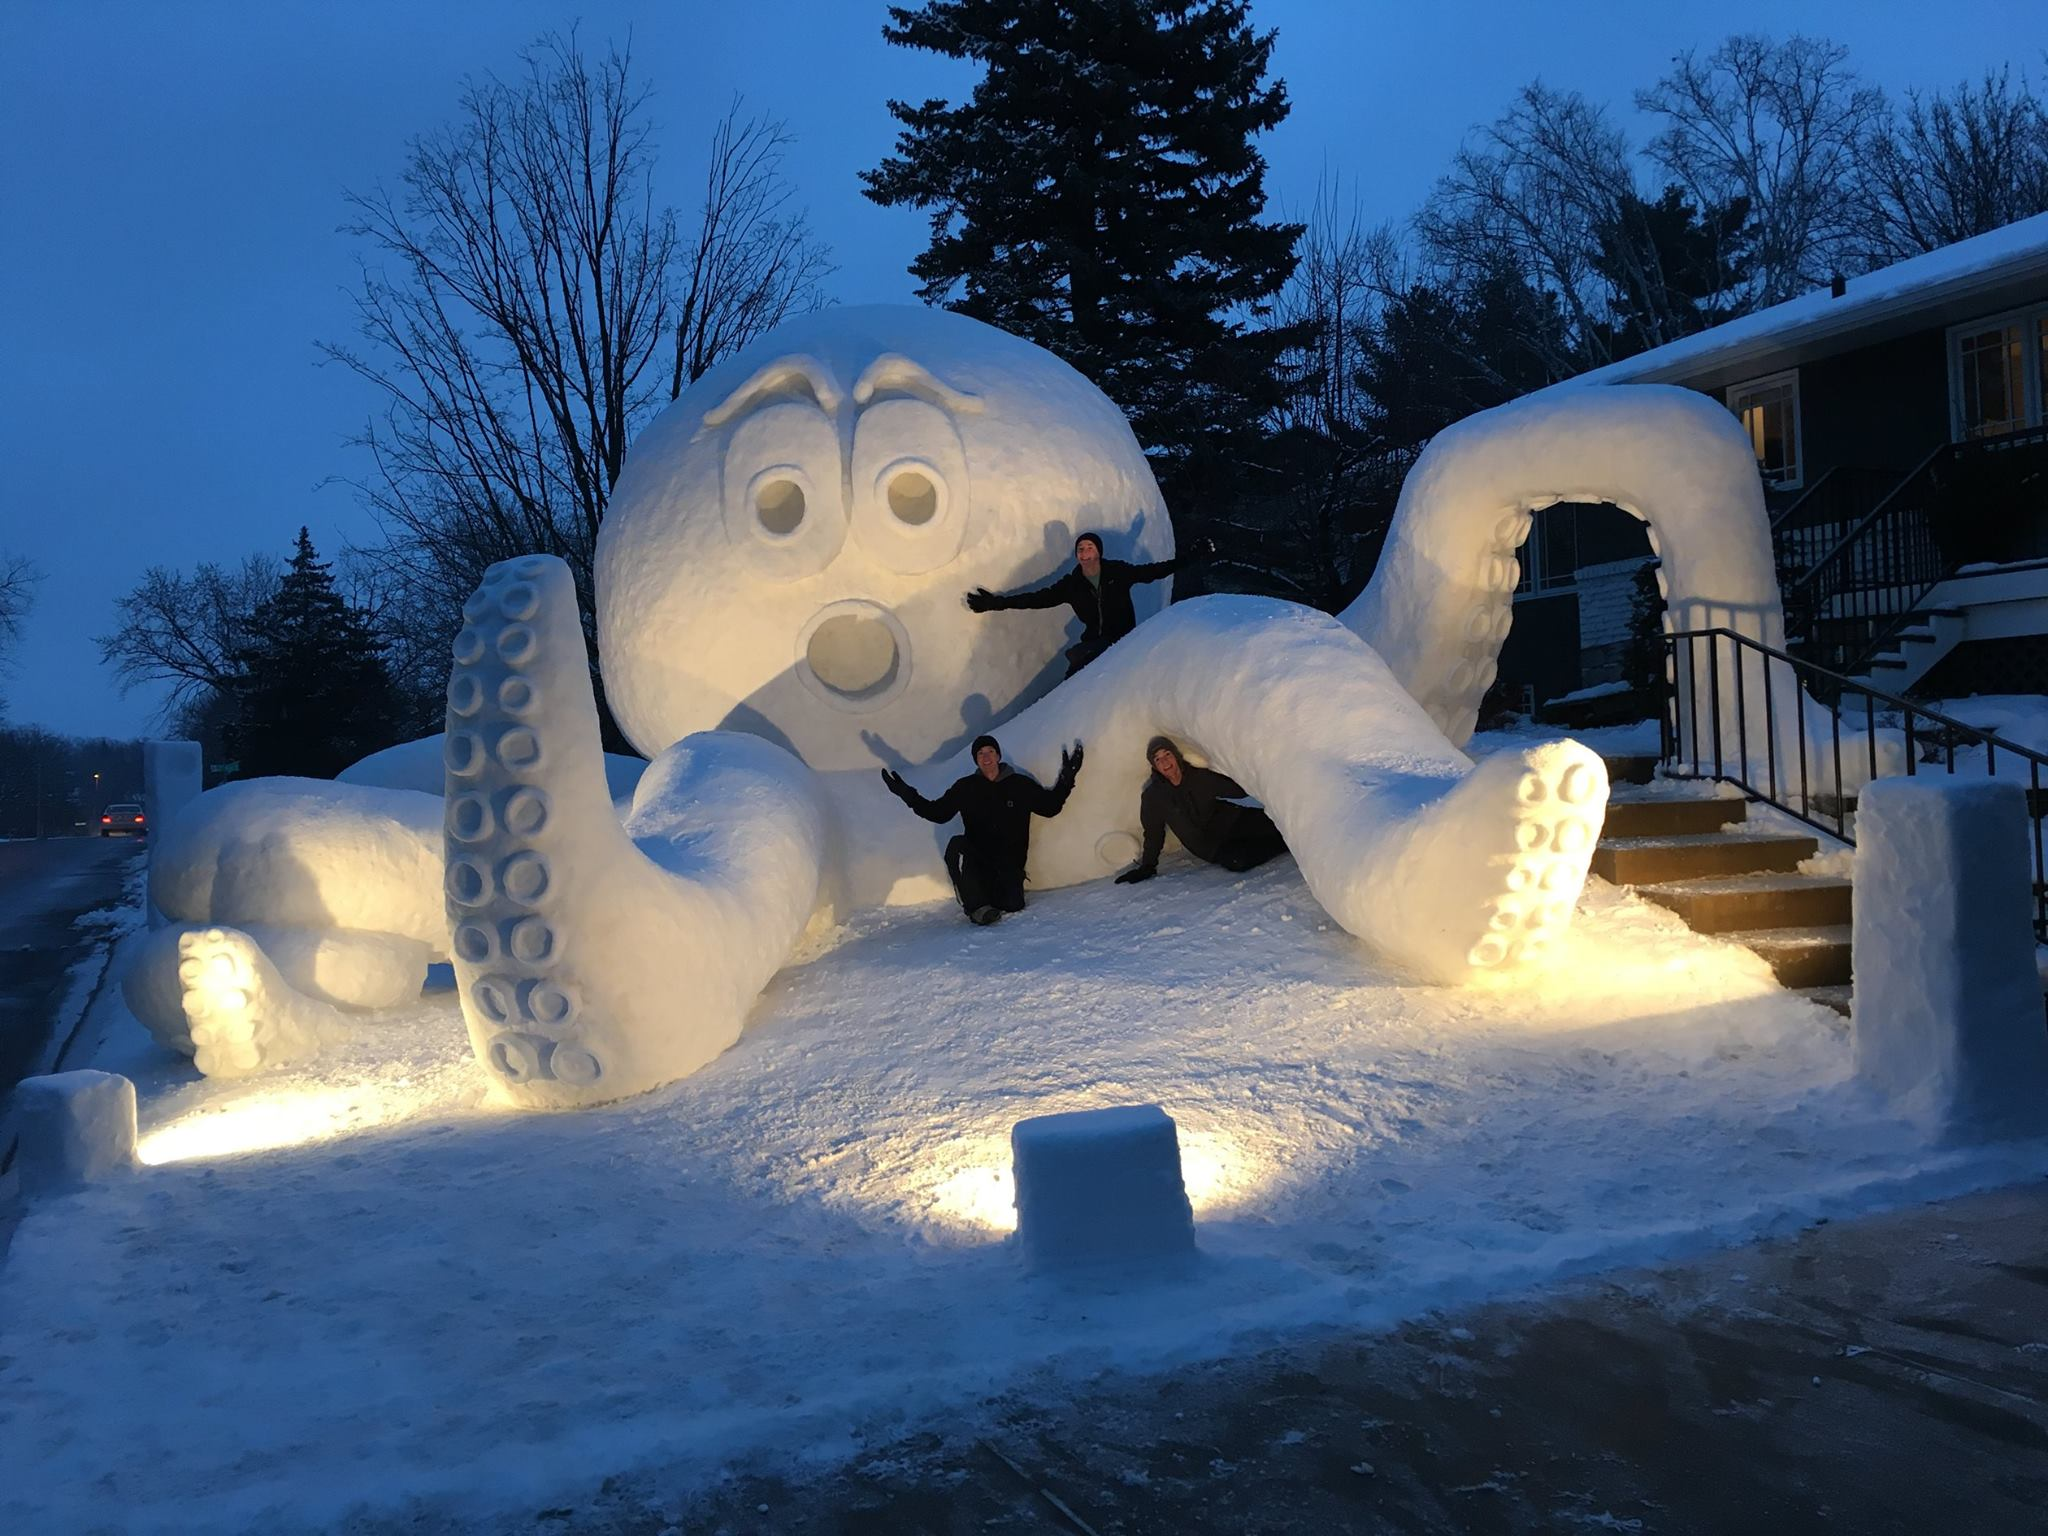 Octavius the Octopus by Bartz Snow Scupltures